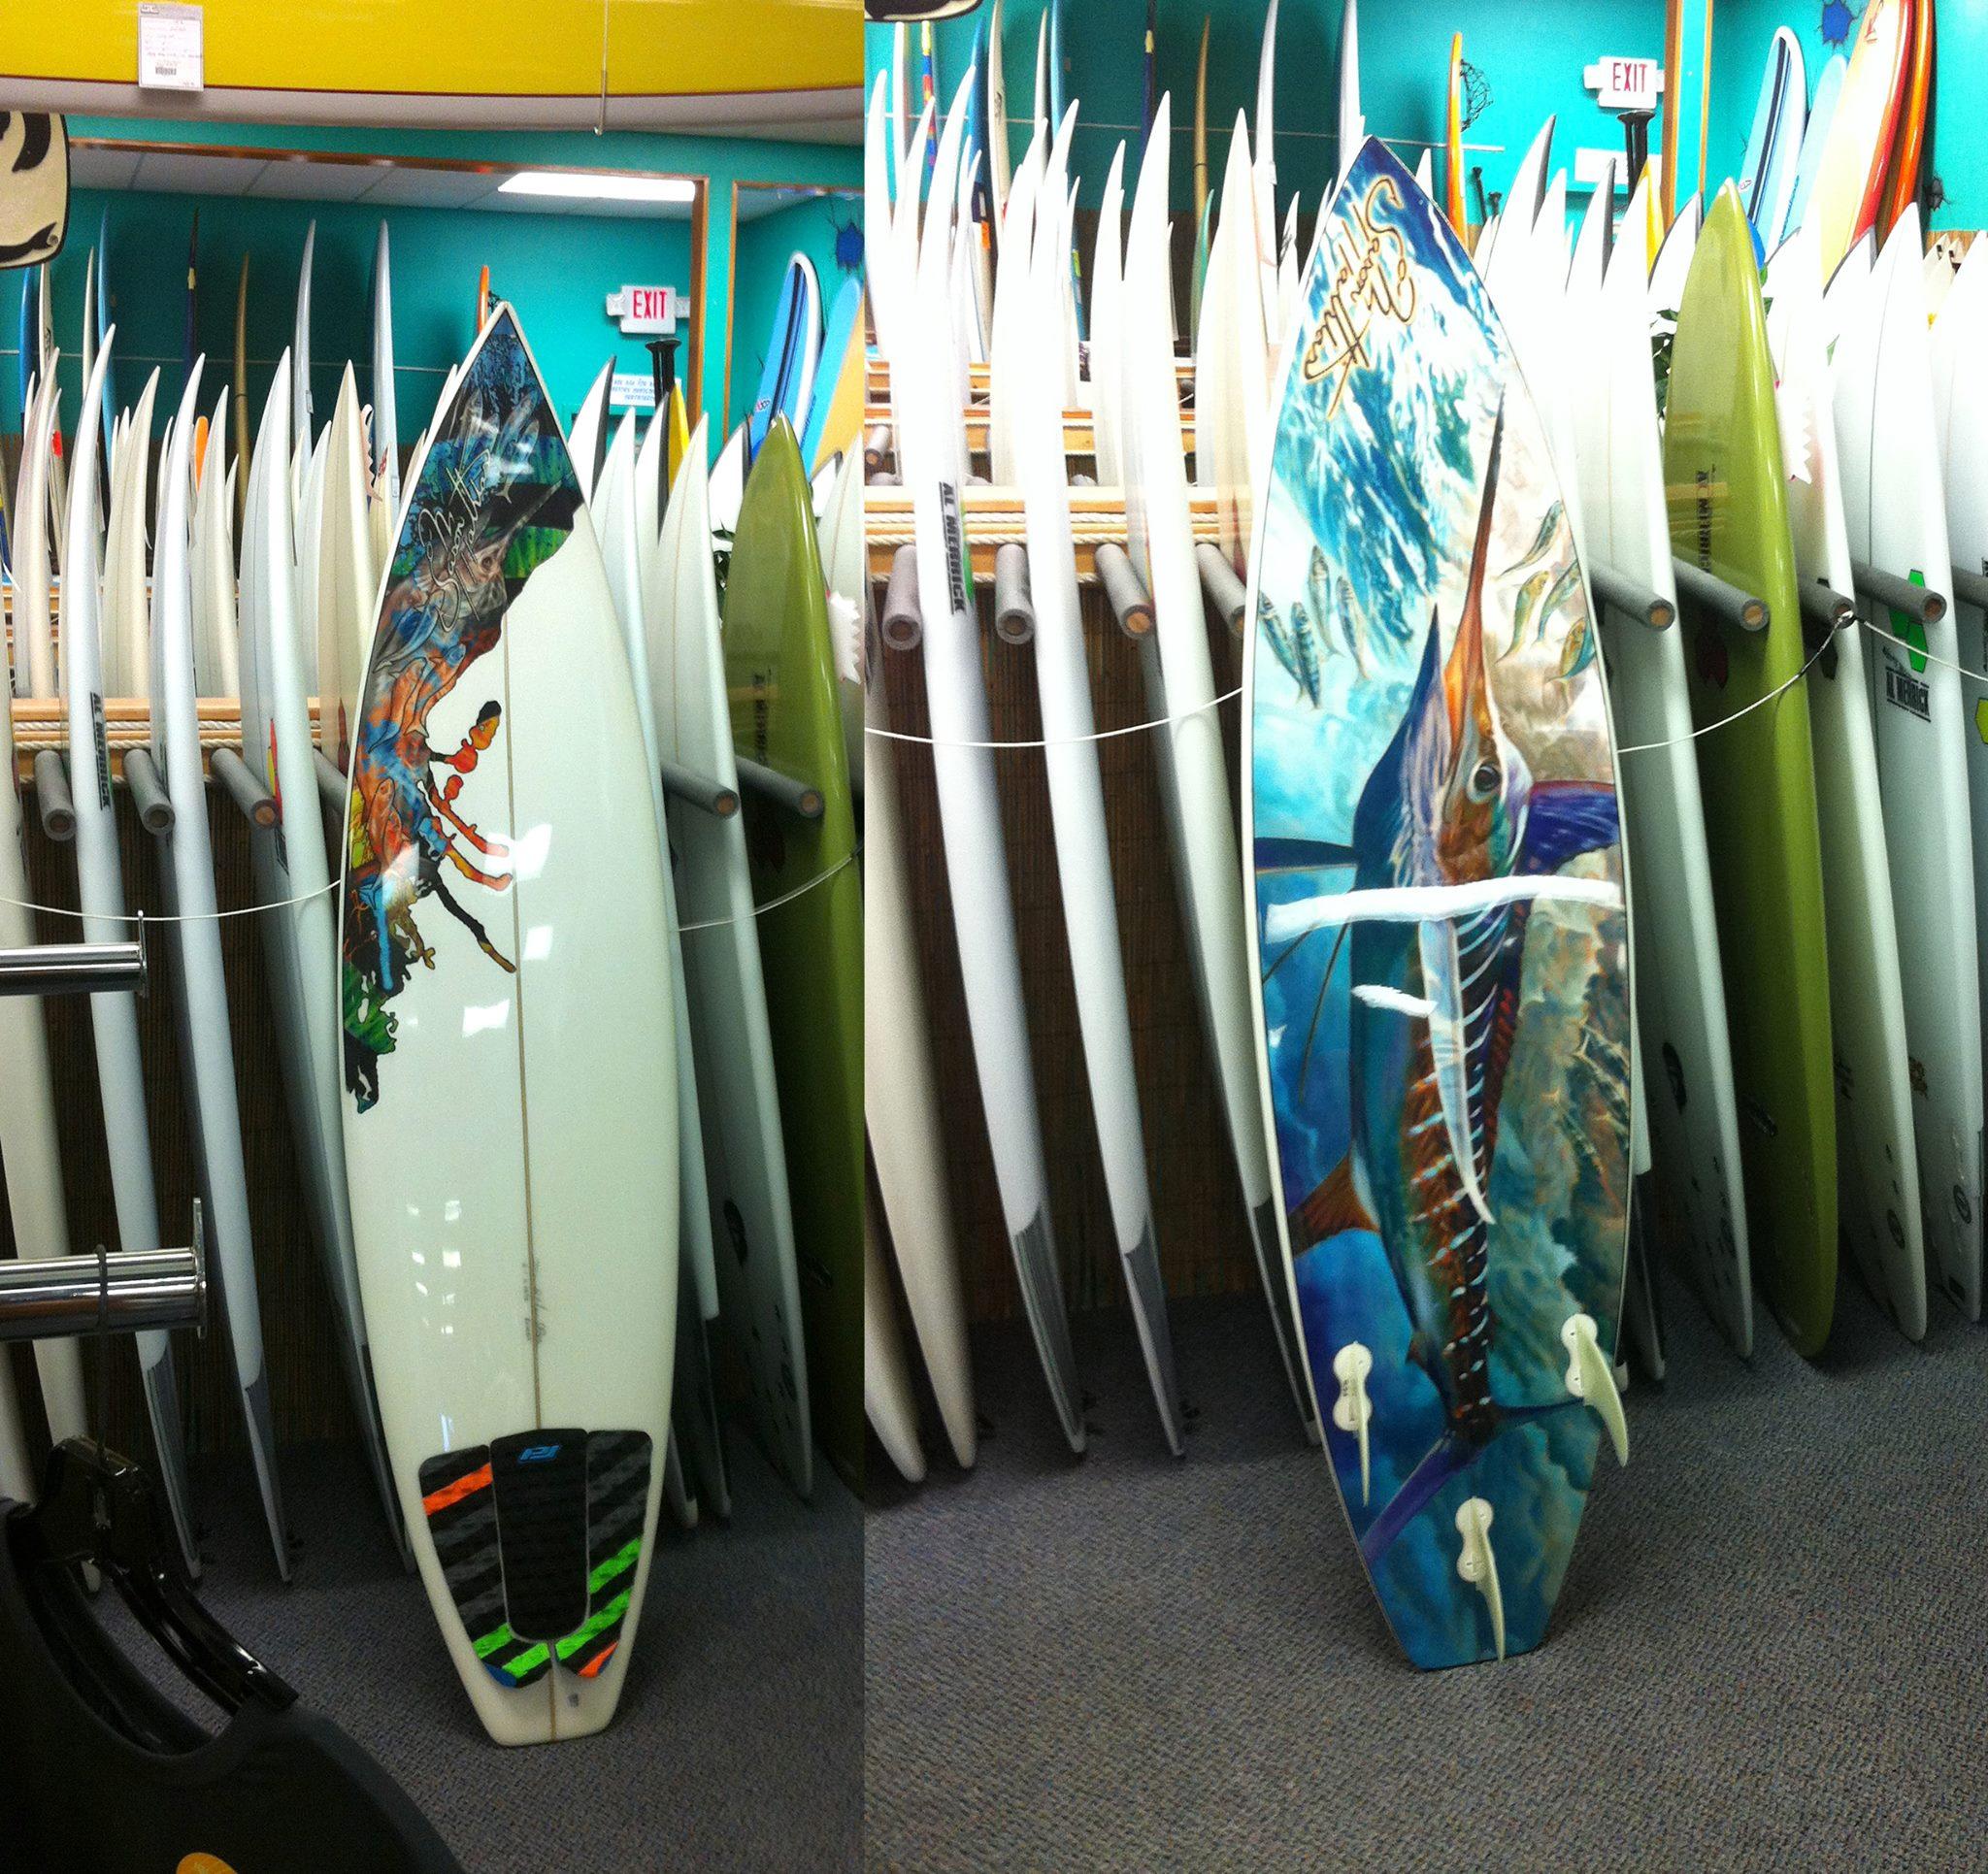 jason-mathias-art-brand-surfboards.jpg